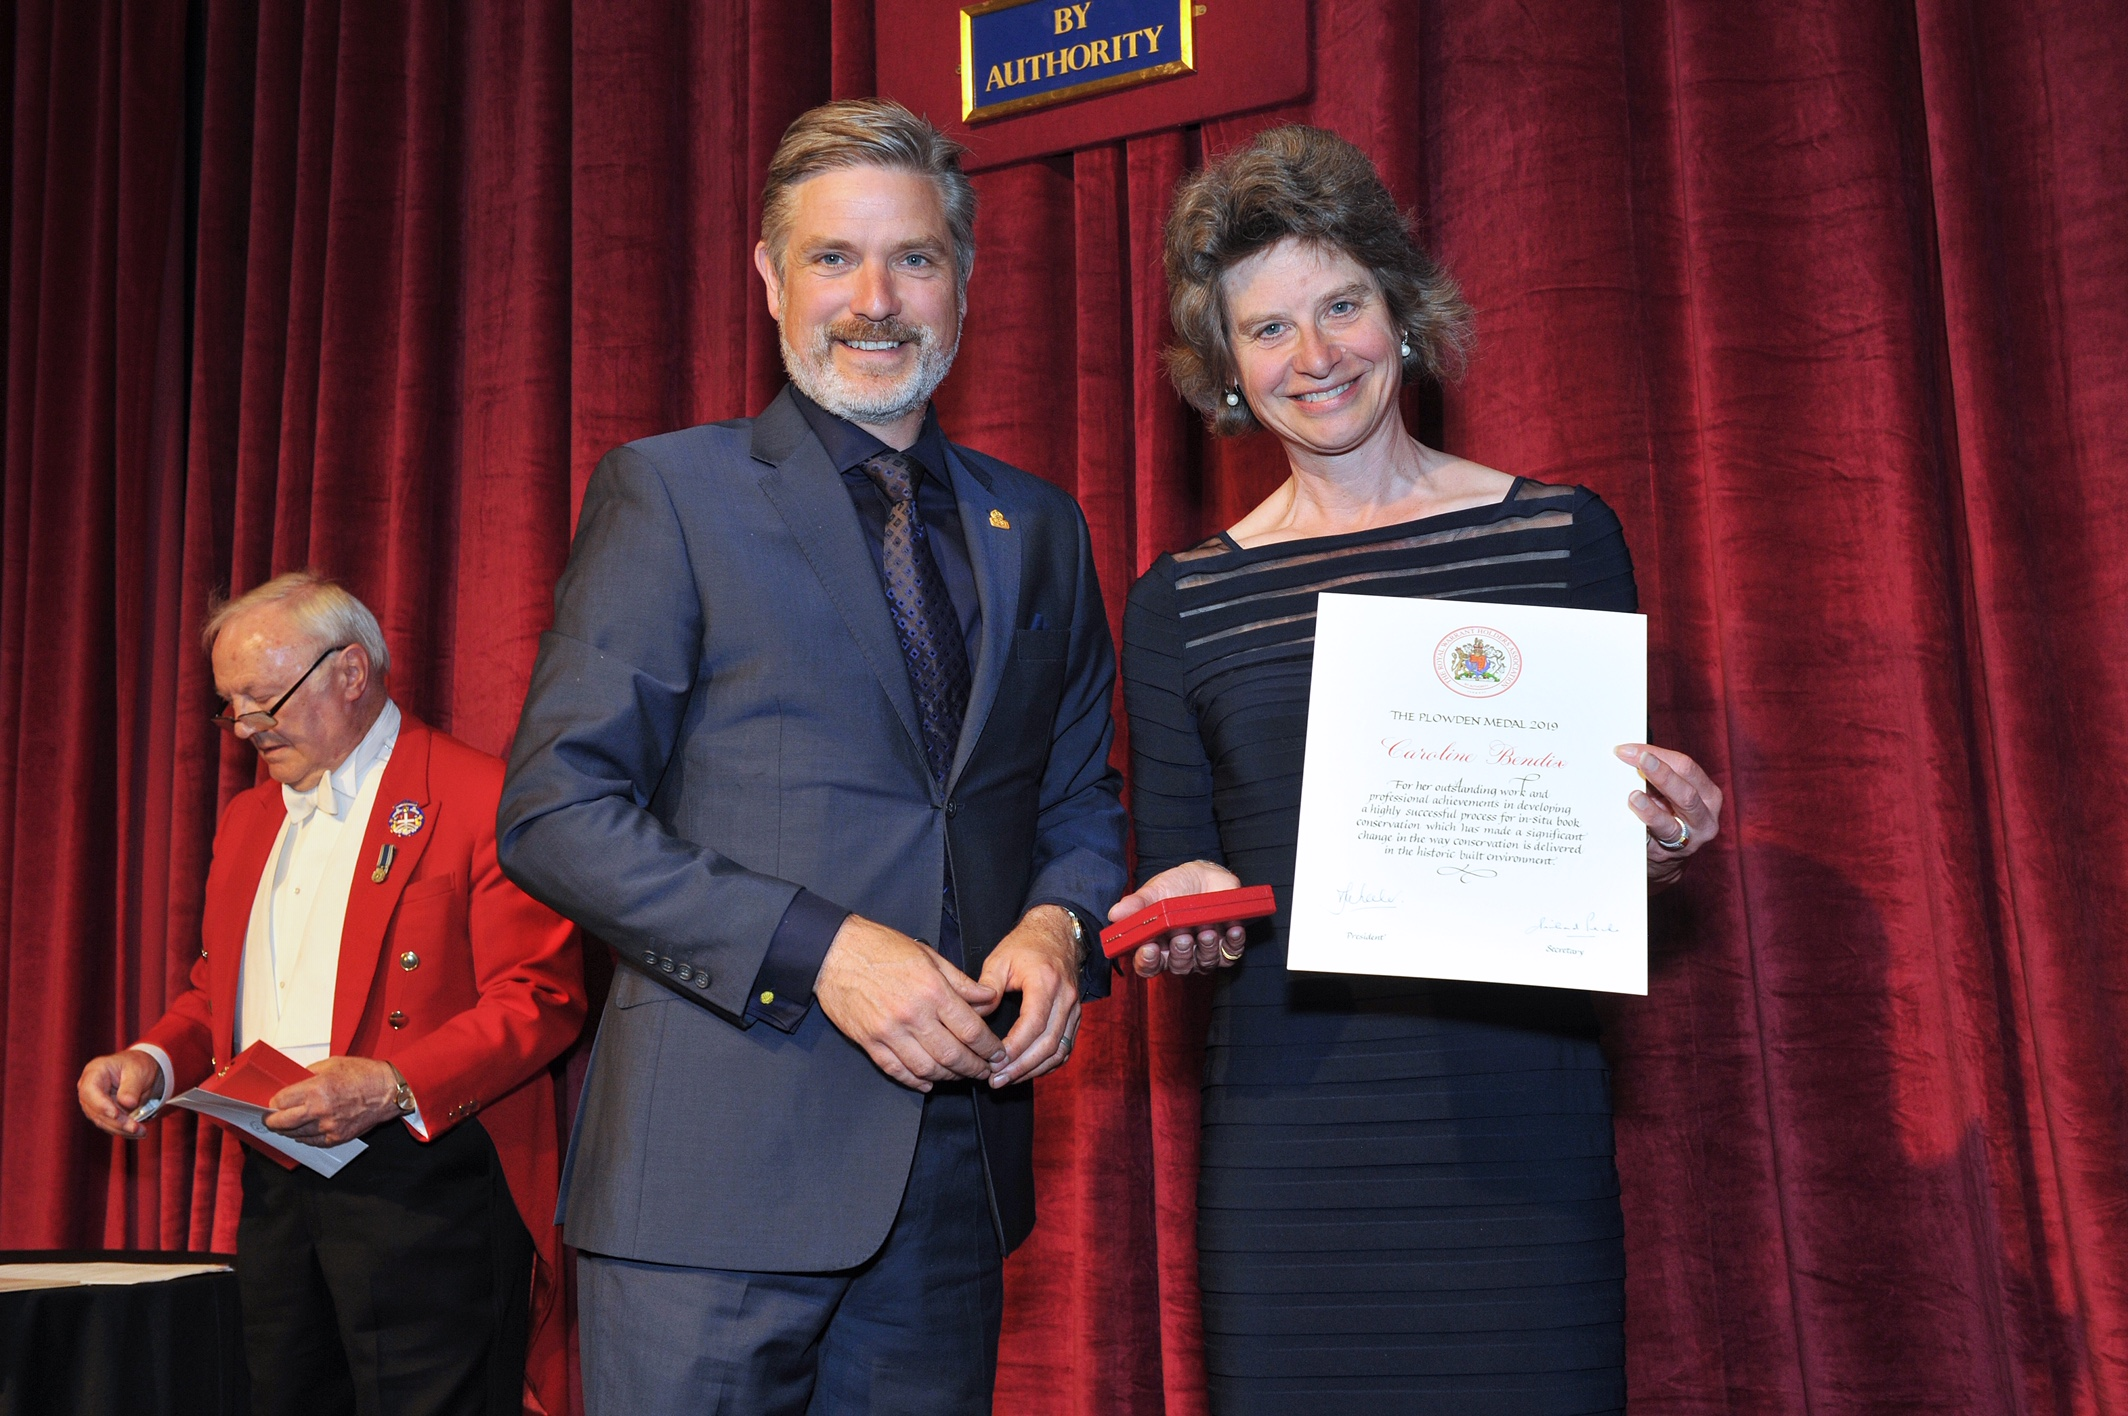 Caroline Bendix receiving her award. Images courtesy of the Royal Warrant Holders association.